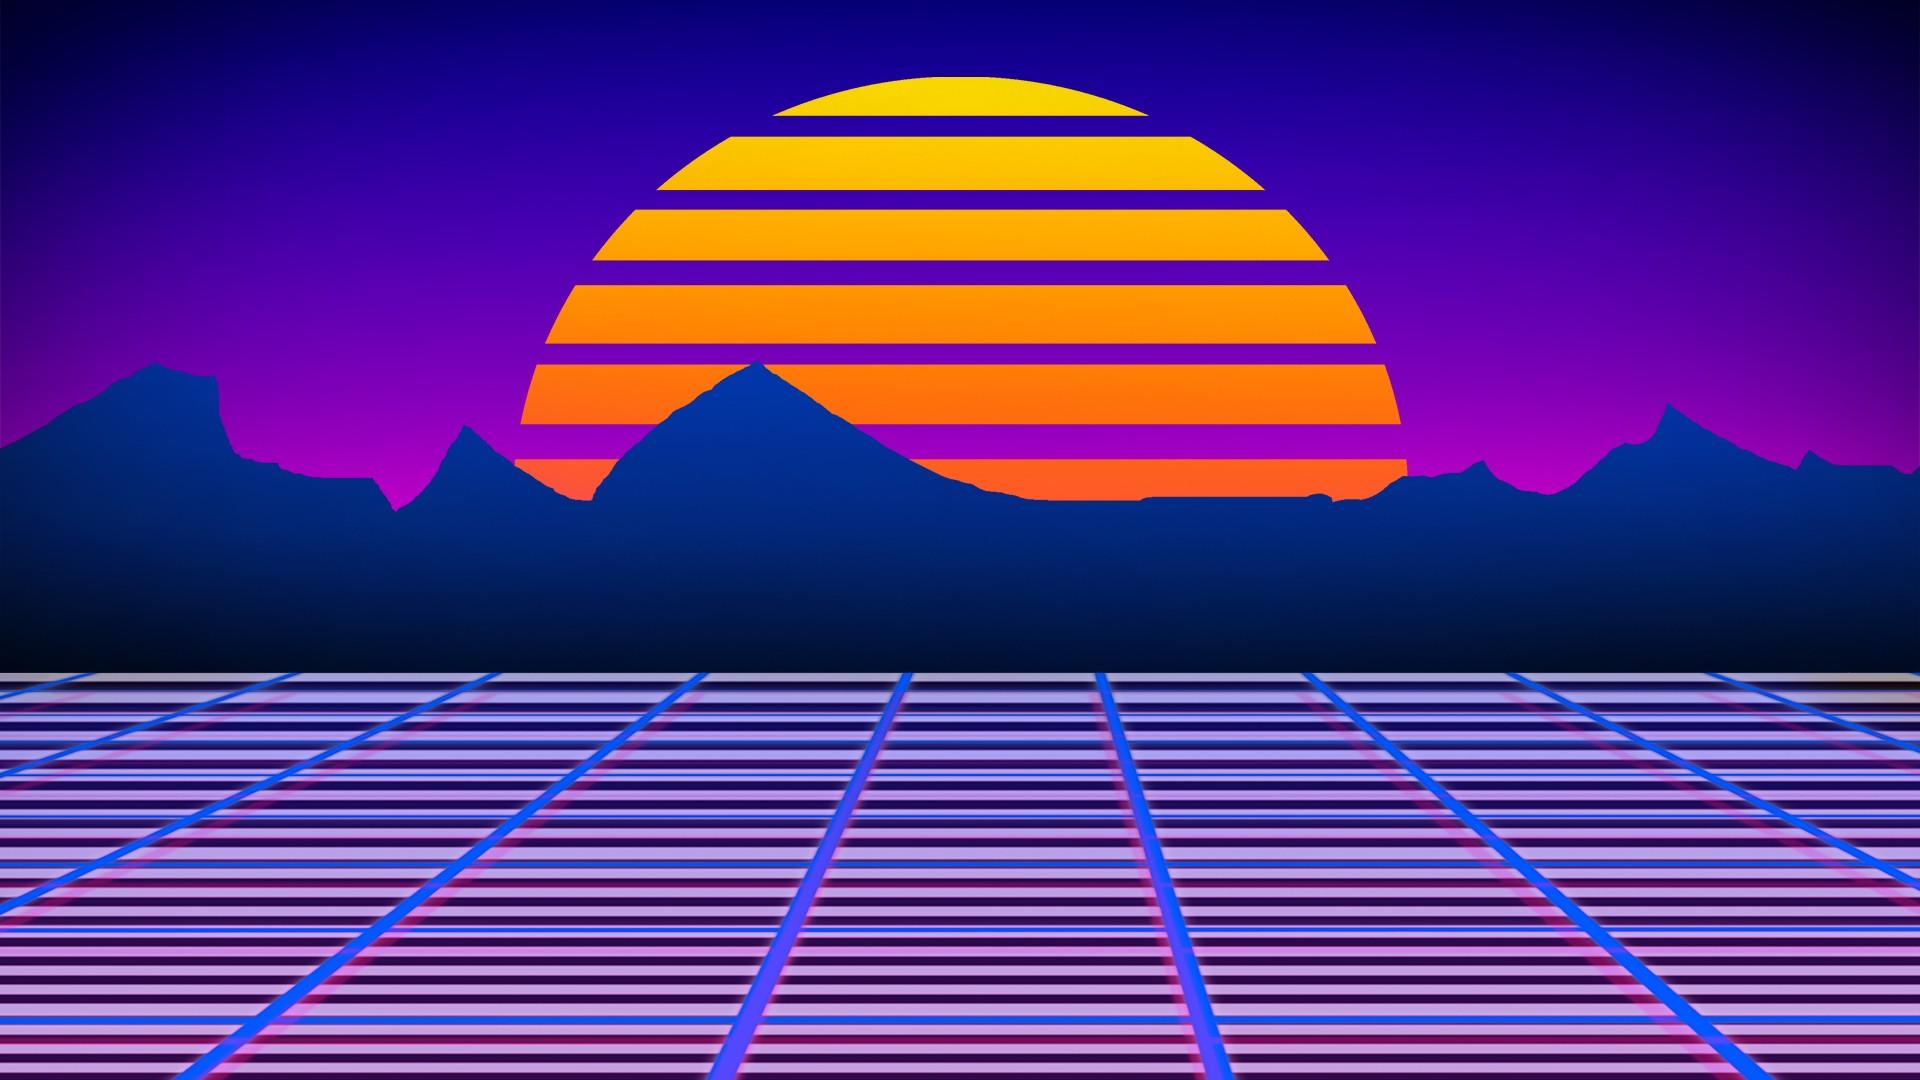 Colorful Illustration Digital Art Sunset Robot Sky Symmetry Skyline Skyscraper Retro Games Sun Horizon Grid 1980s